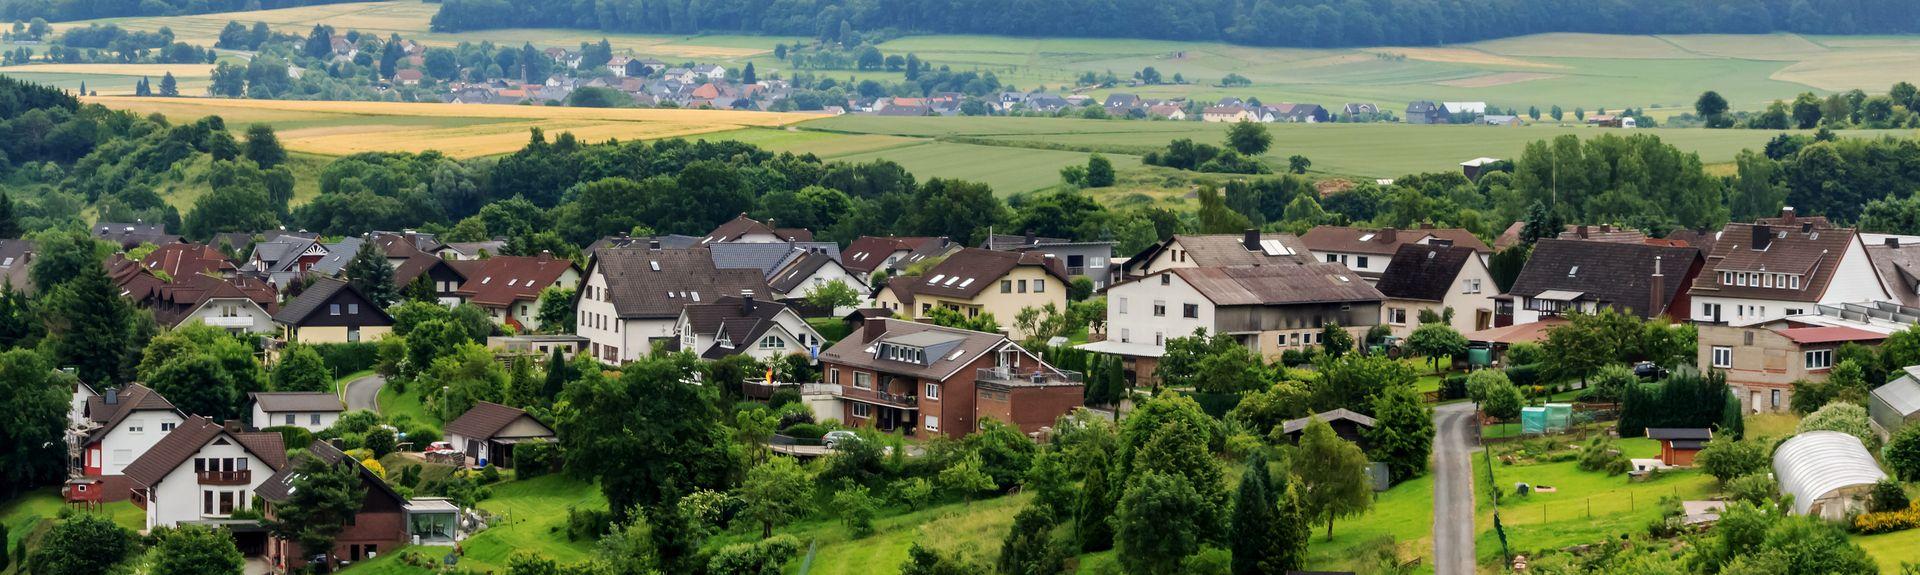 Waldeck, Germany